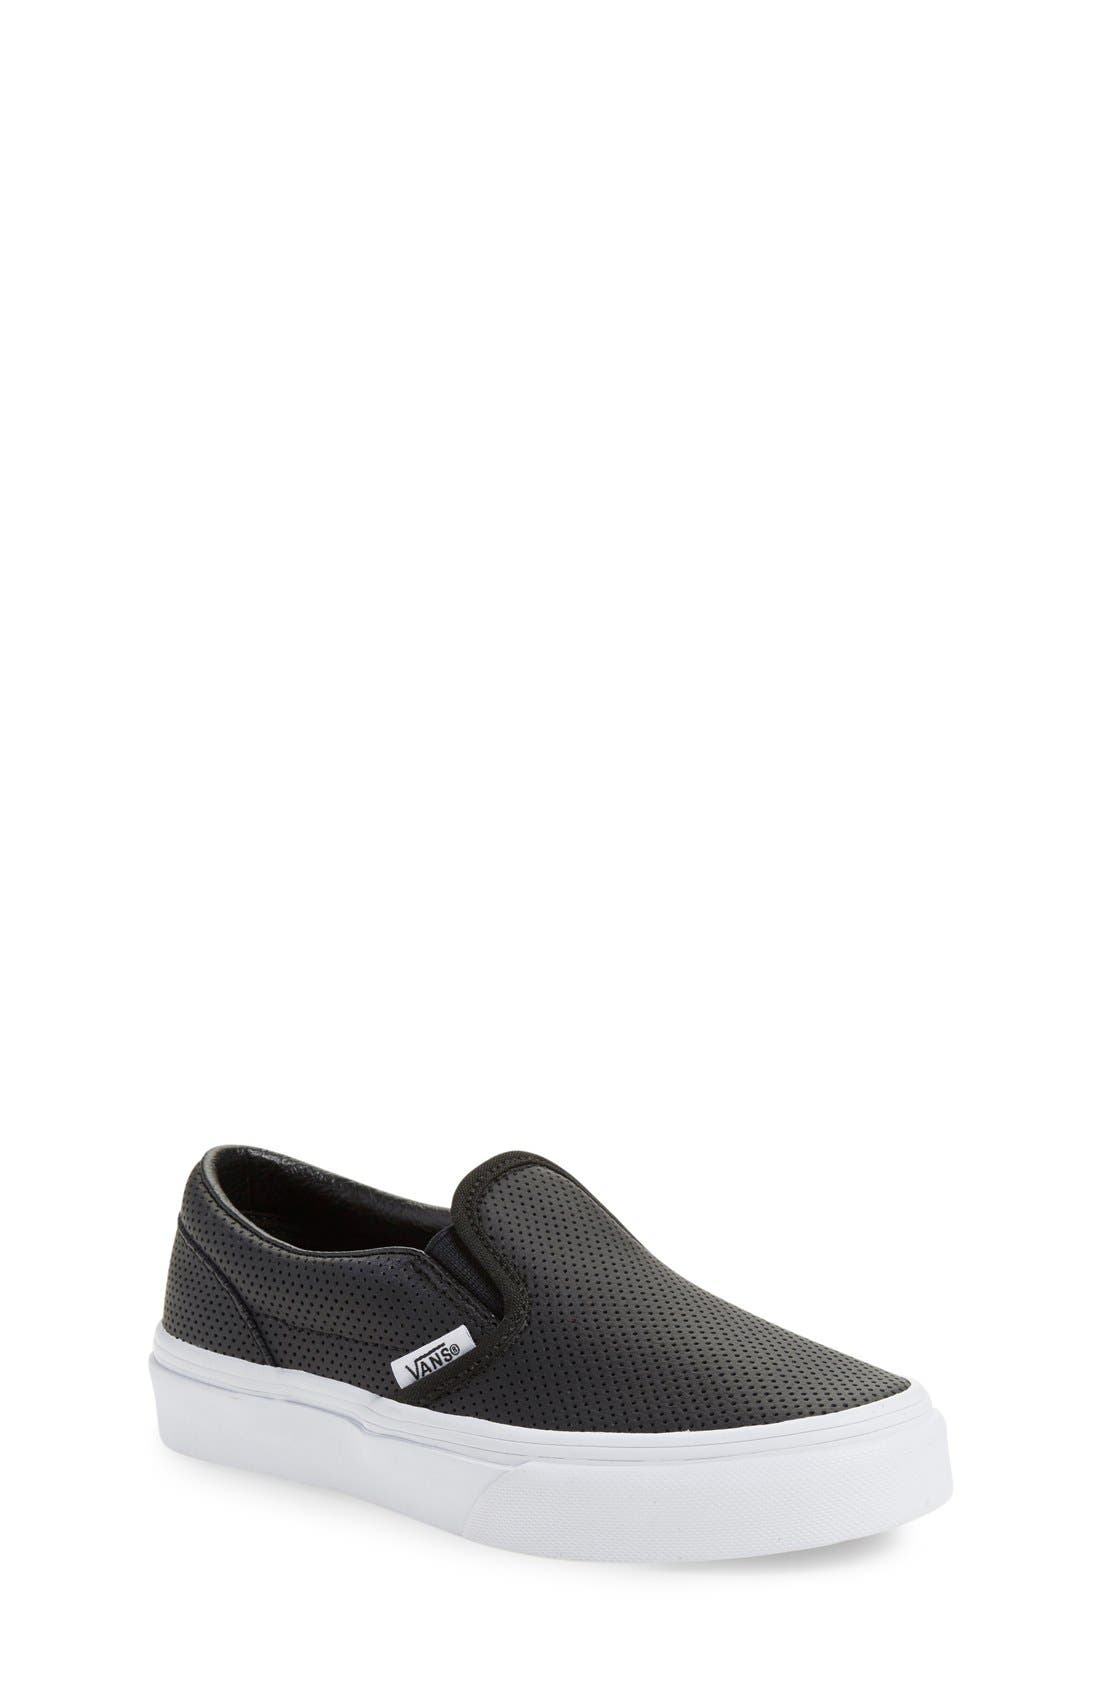 'Classic' Slip-On Sneaker,                             Main thumbnail 1, color,                             Black Leather